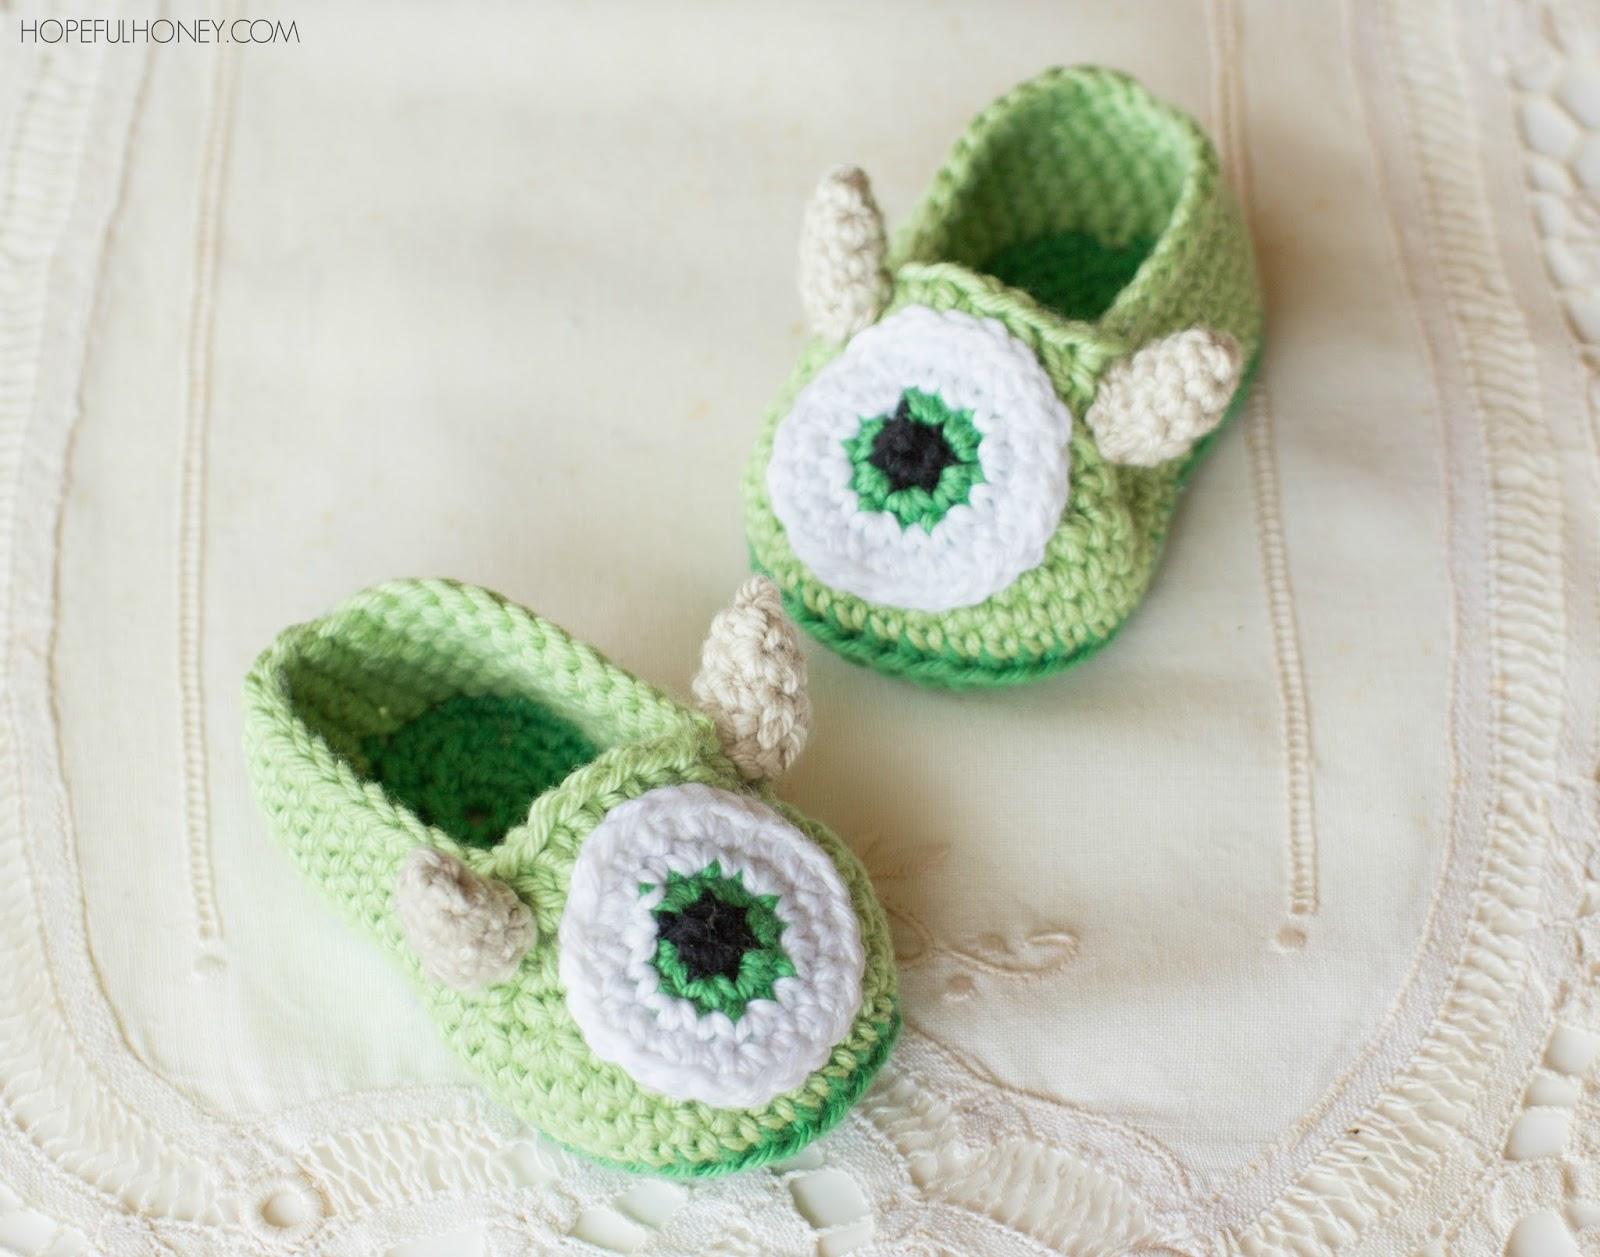 Baby Booties Crochet Pattern Dk Wool : Hopeful Honey Craft, Crochet, Create: Friendly Monster ...